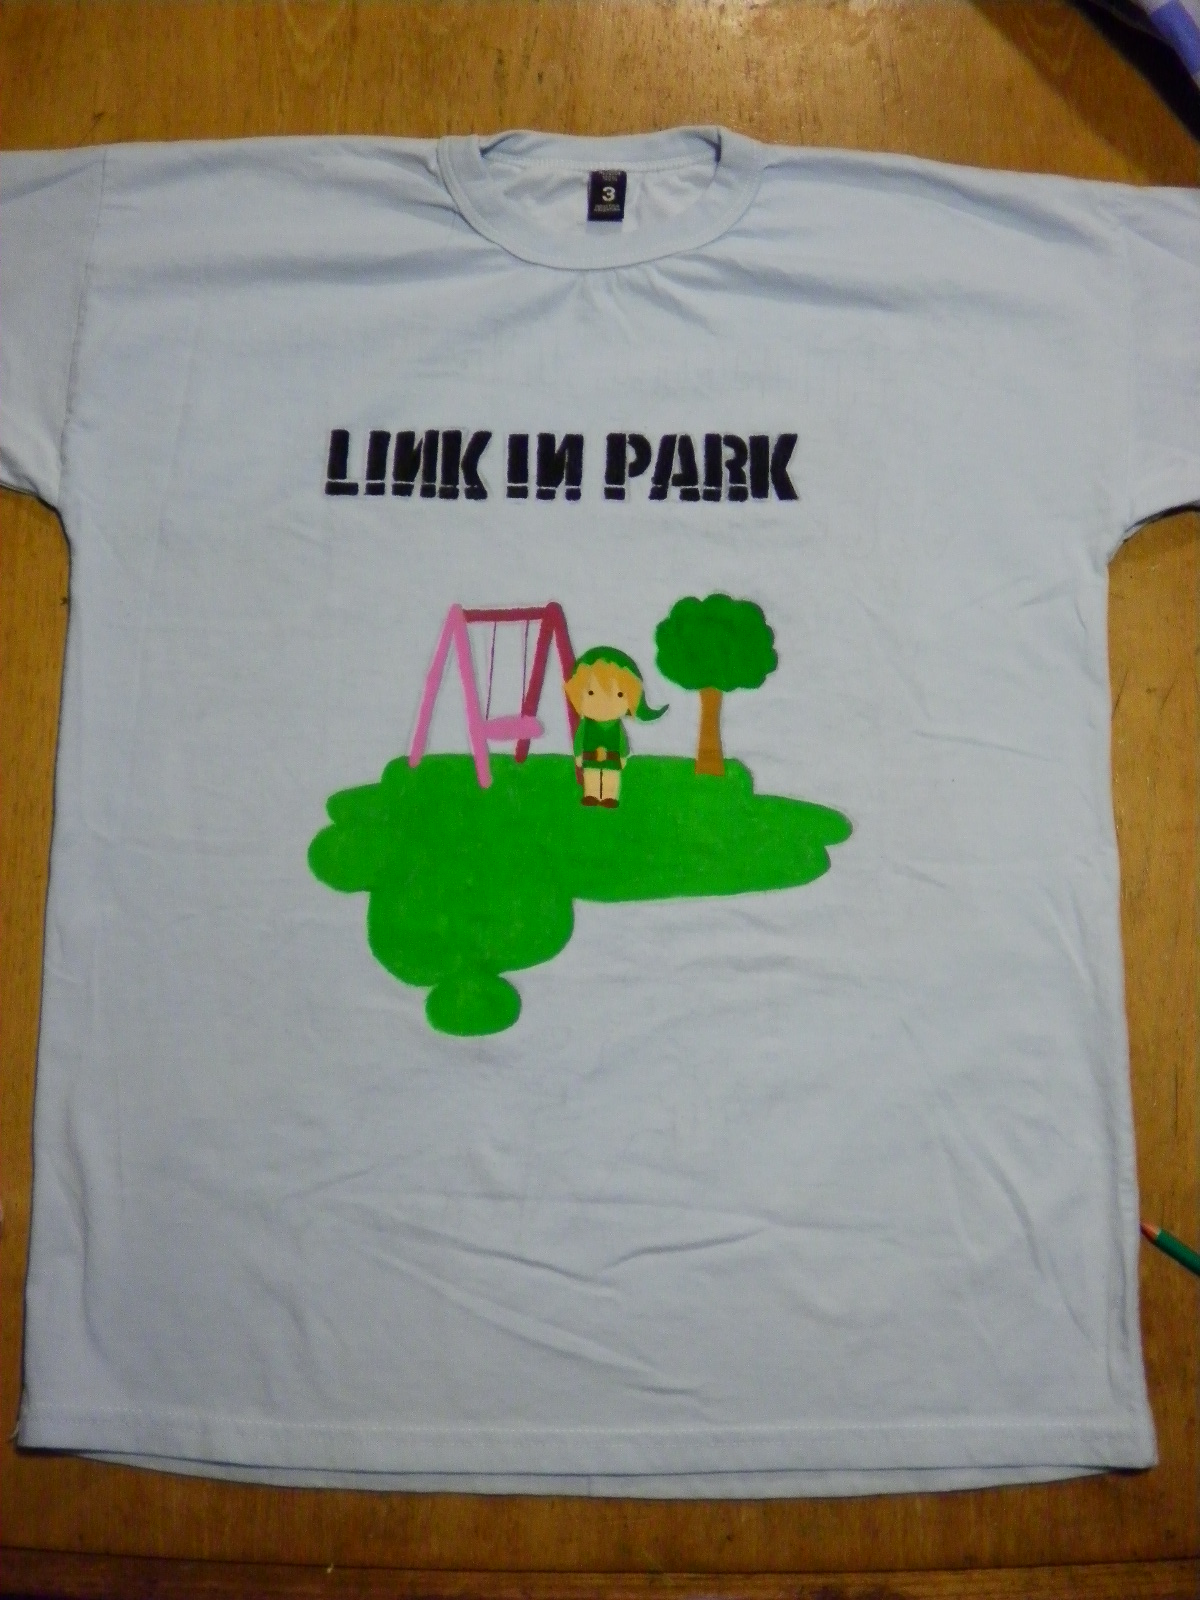 Link in Park.